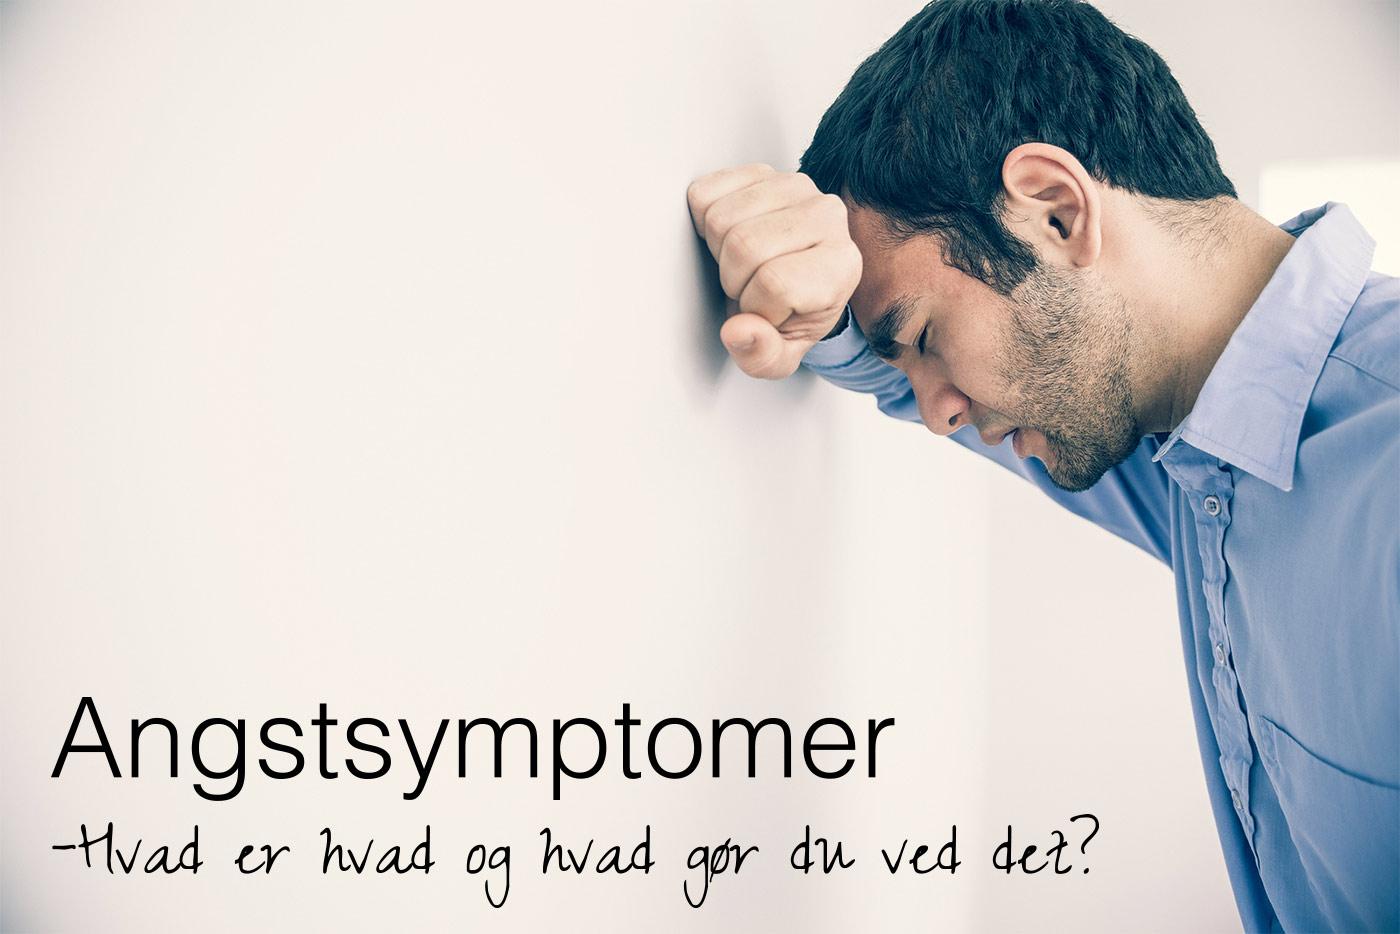 Angstymptomer